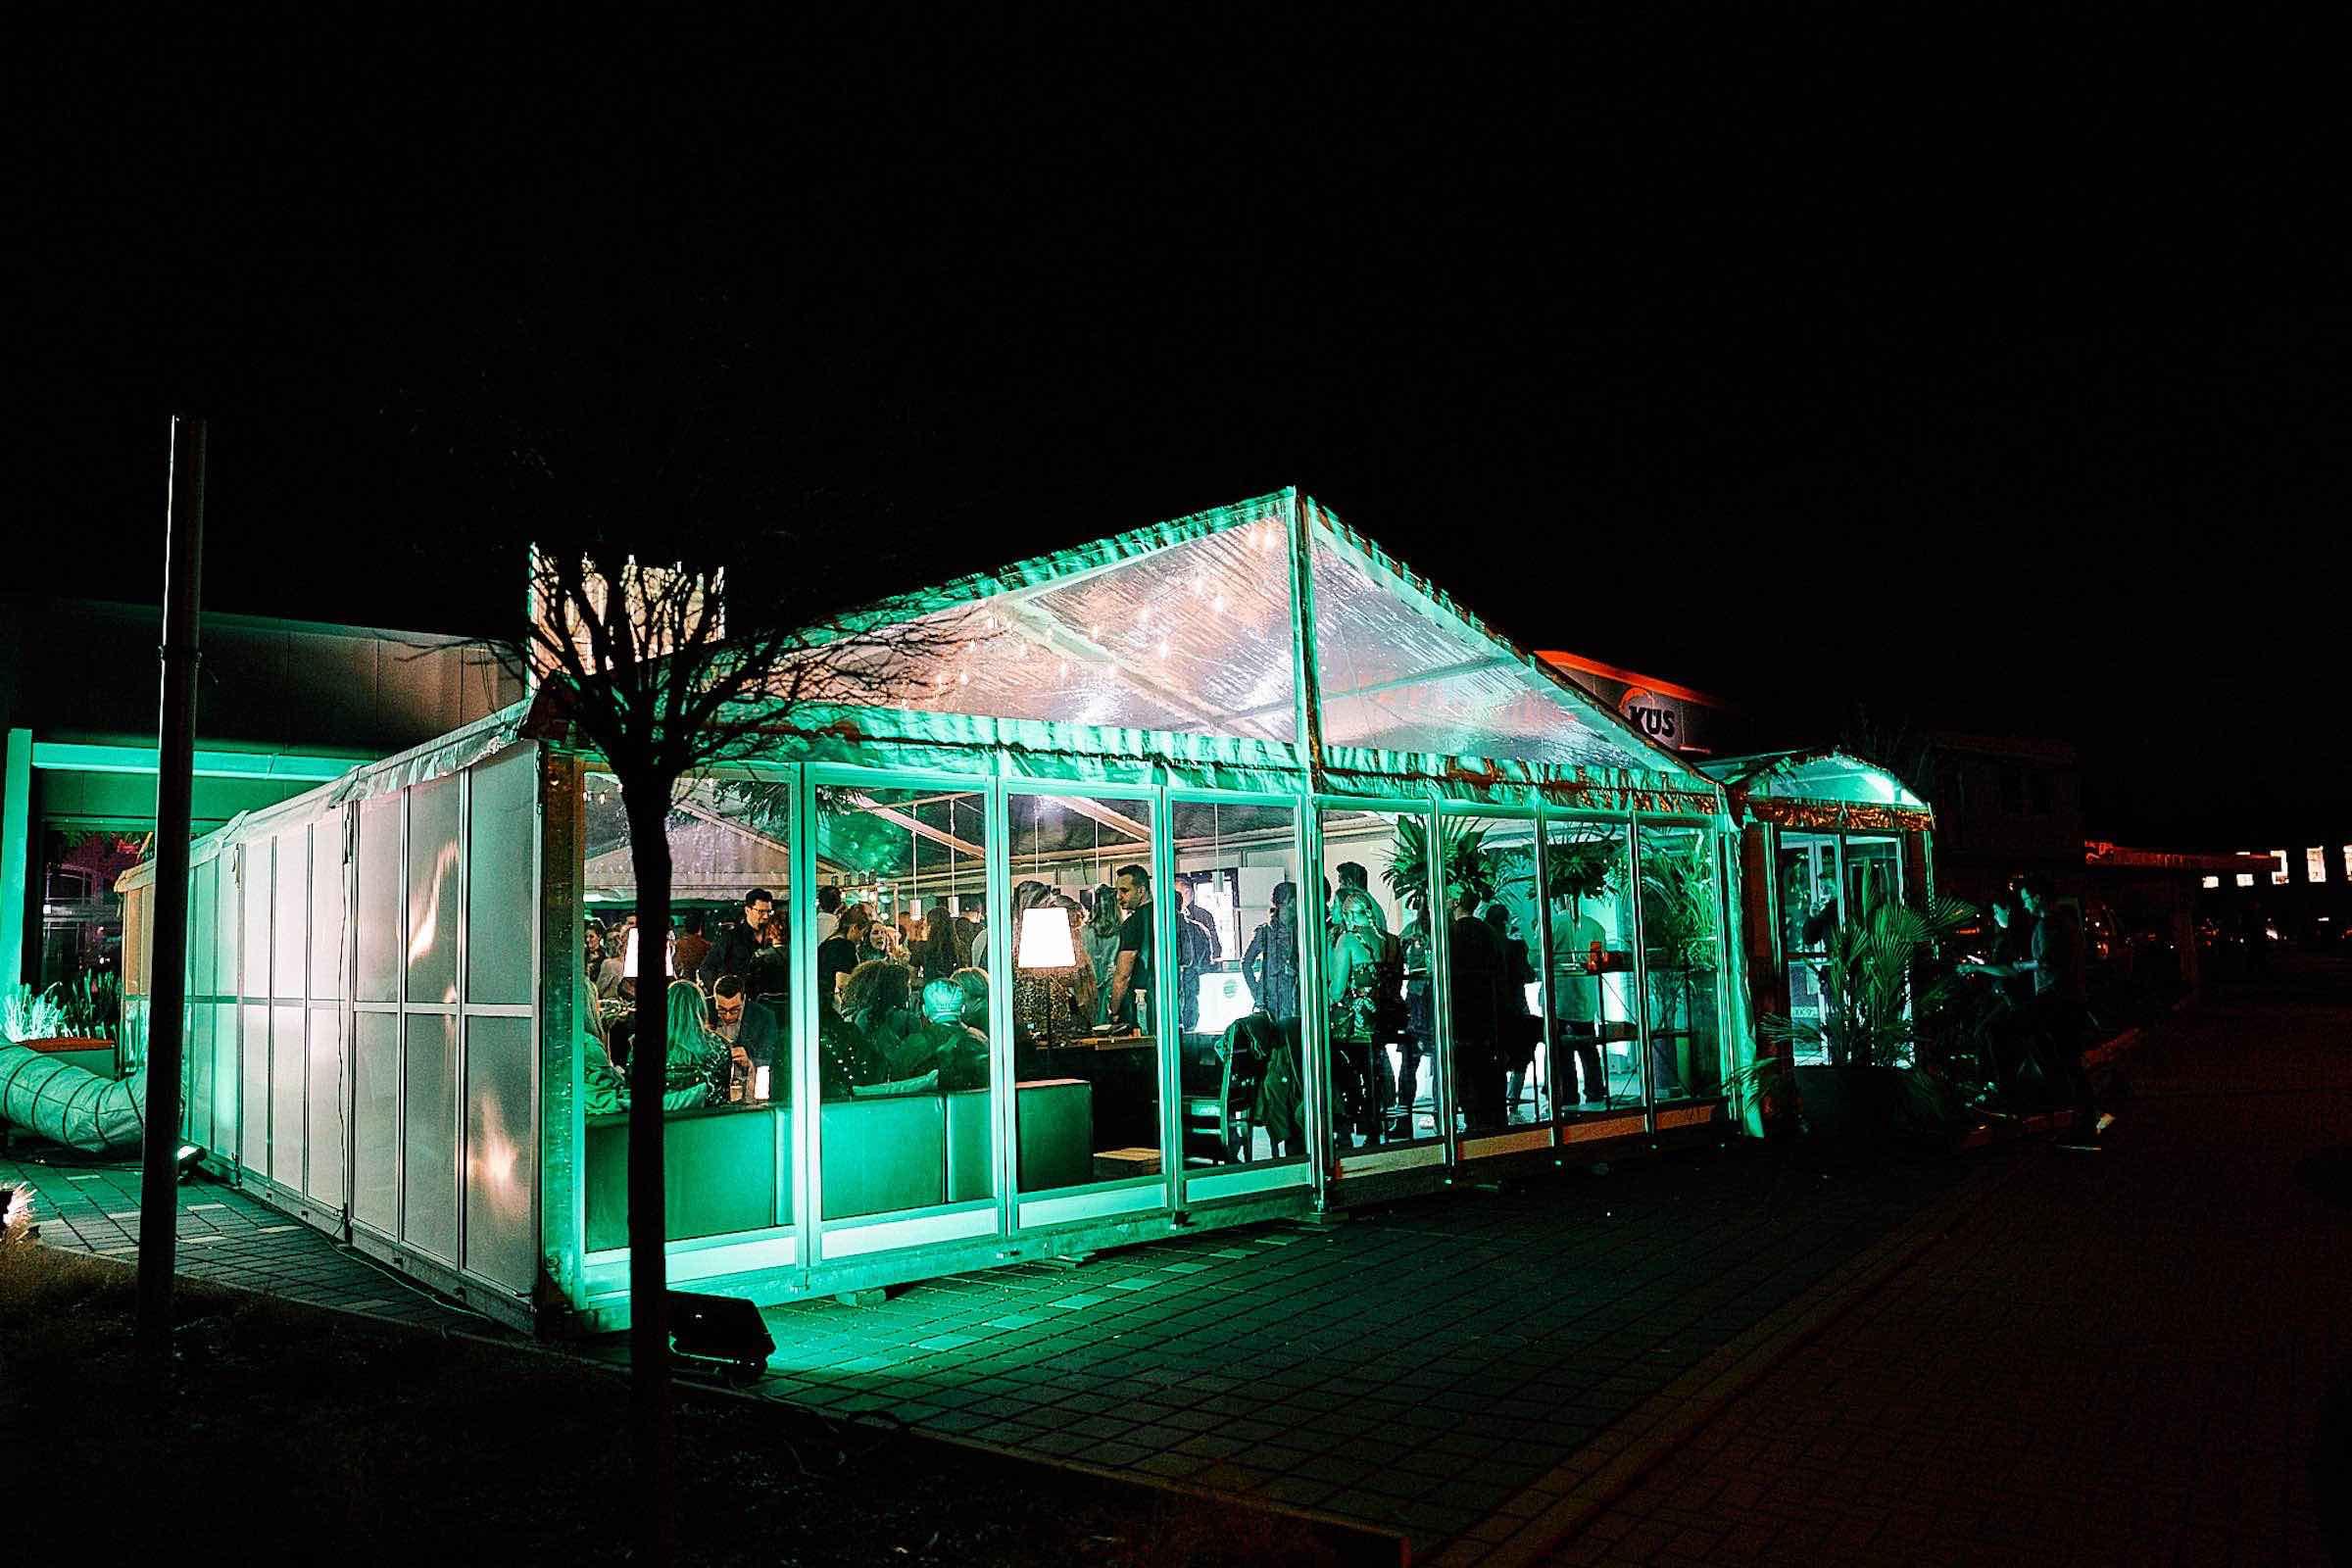 Eventplanung | Eventausstatung | Catering | Hannover | Kongresse | Shows | Galas Modenschauen | Bühnen | Licht | Tontechnik | Logistik | Dekoration | Programmgestaltung | Künstler